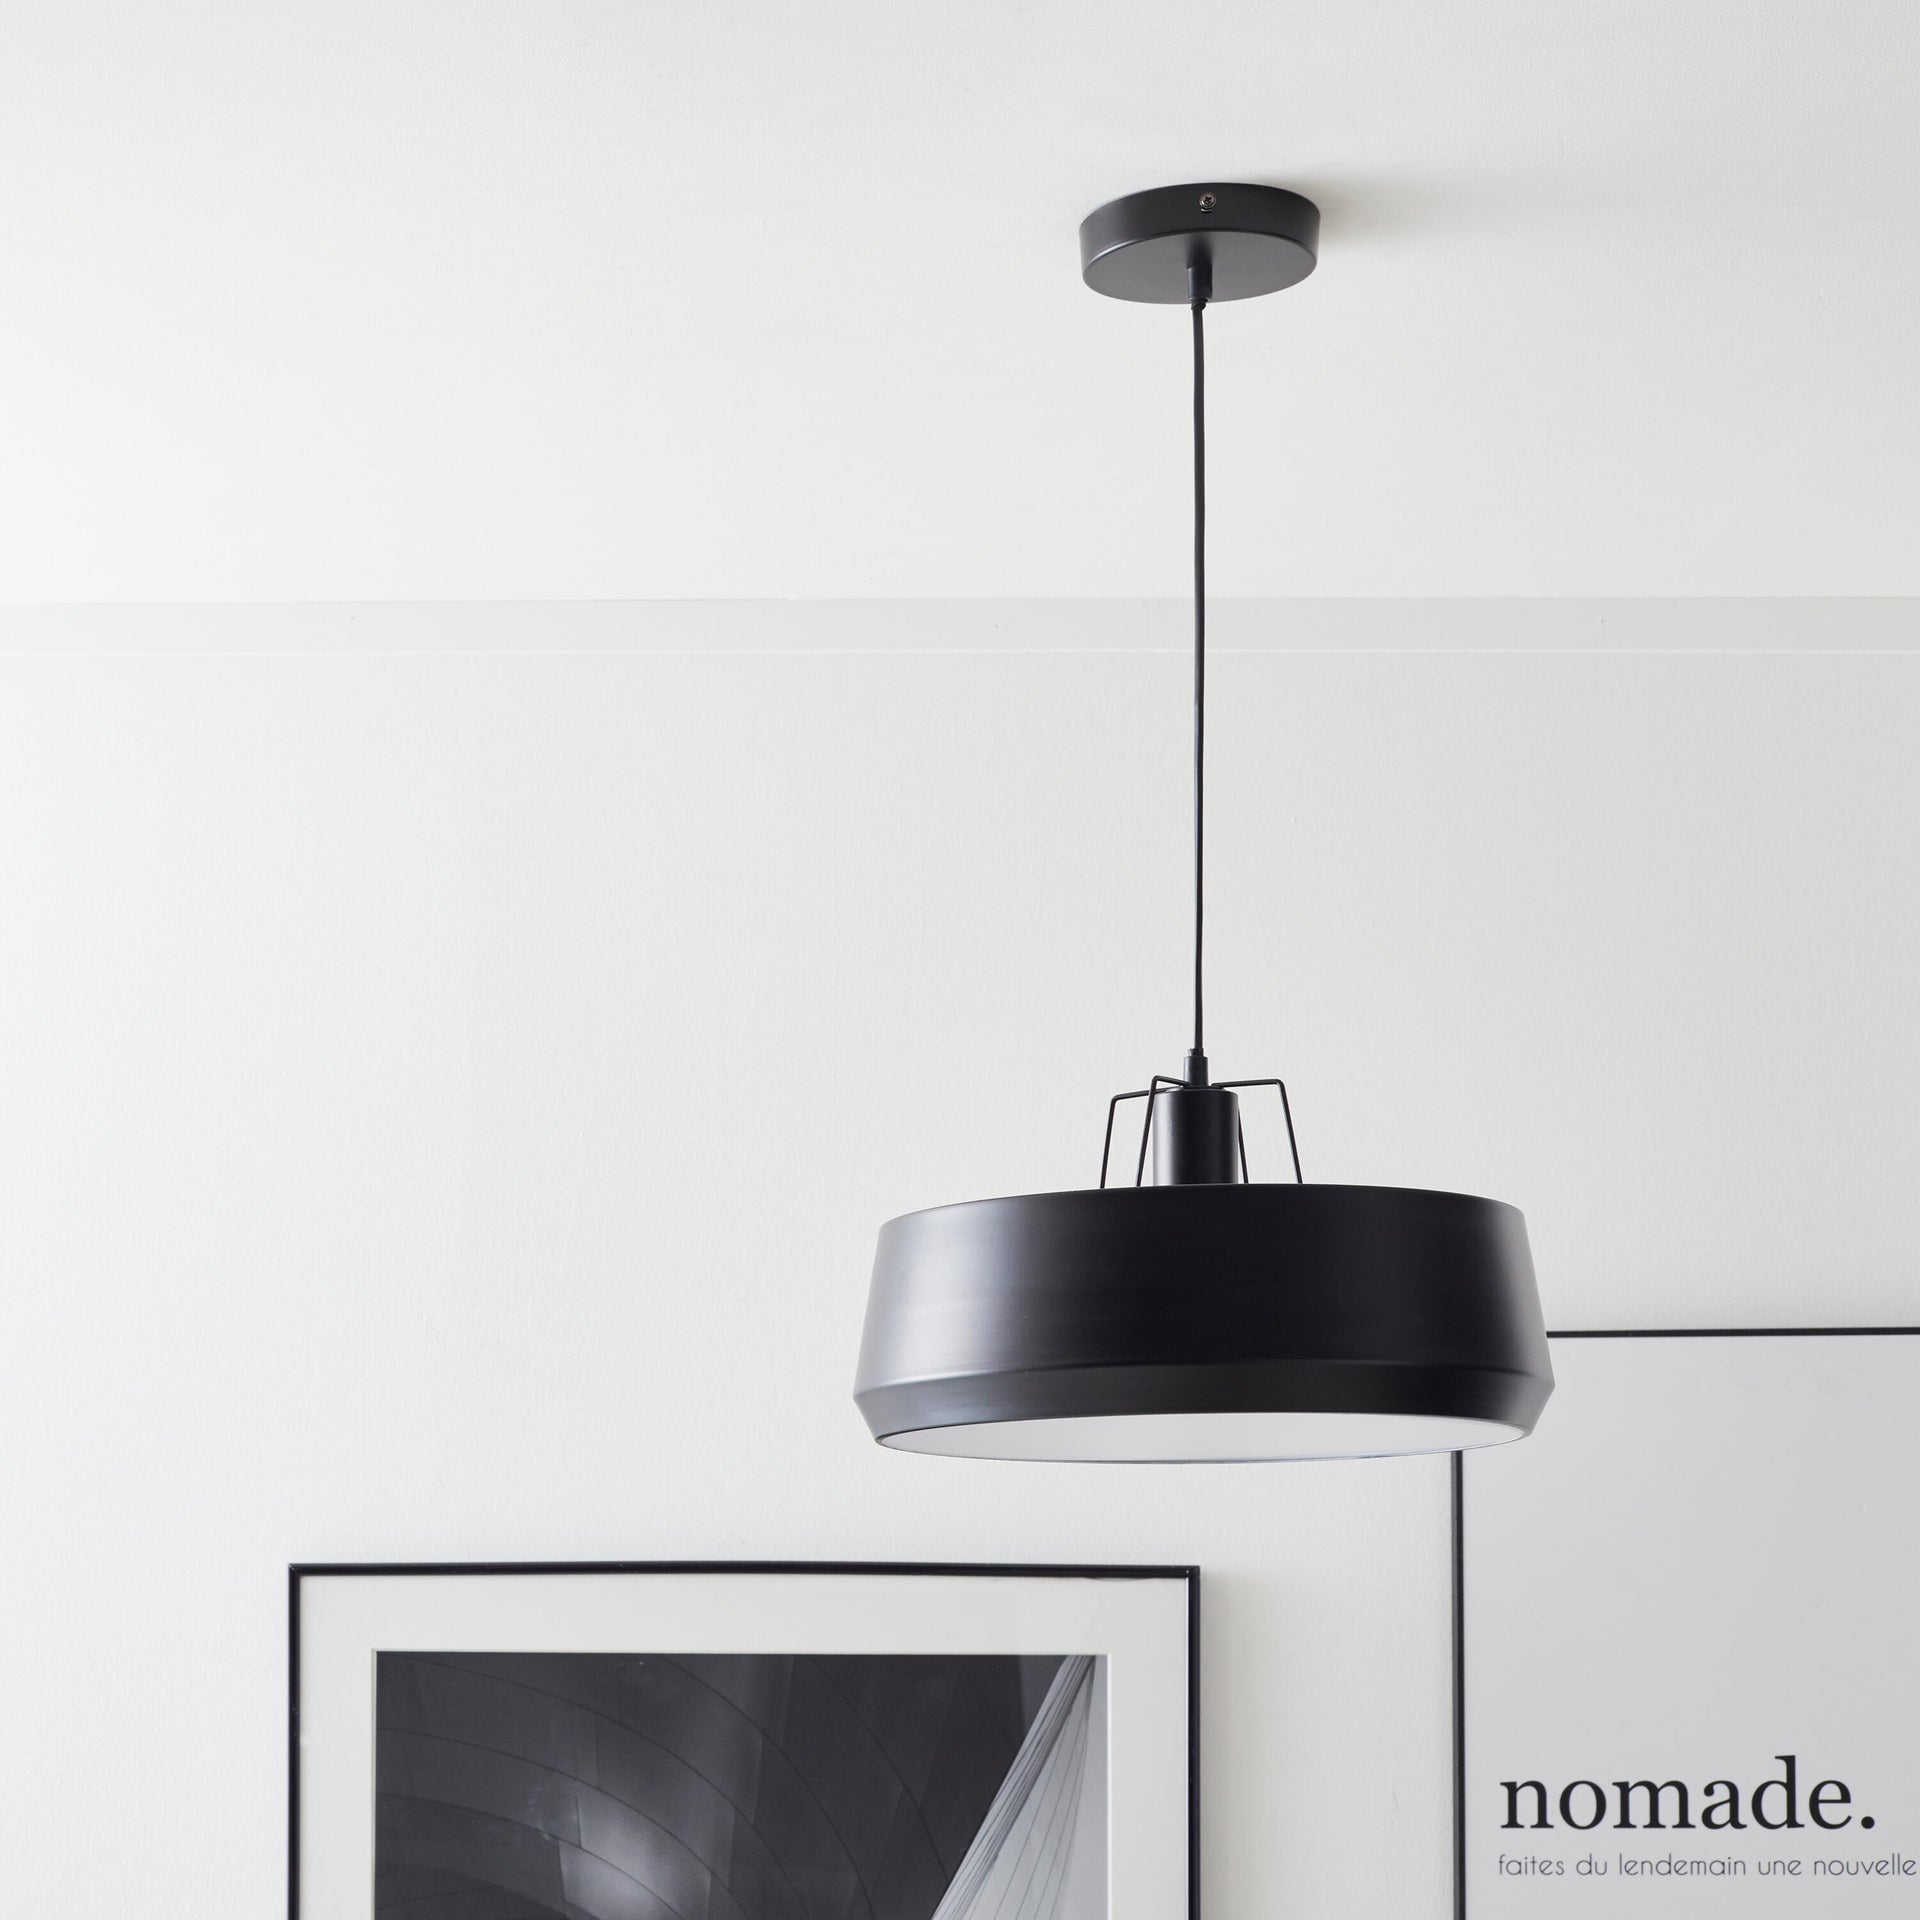 Lampadario Industriale Glint nero in metallo, D. 35 cm, L. 32 cm, INSPIRE - 2